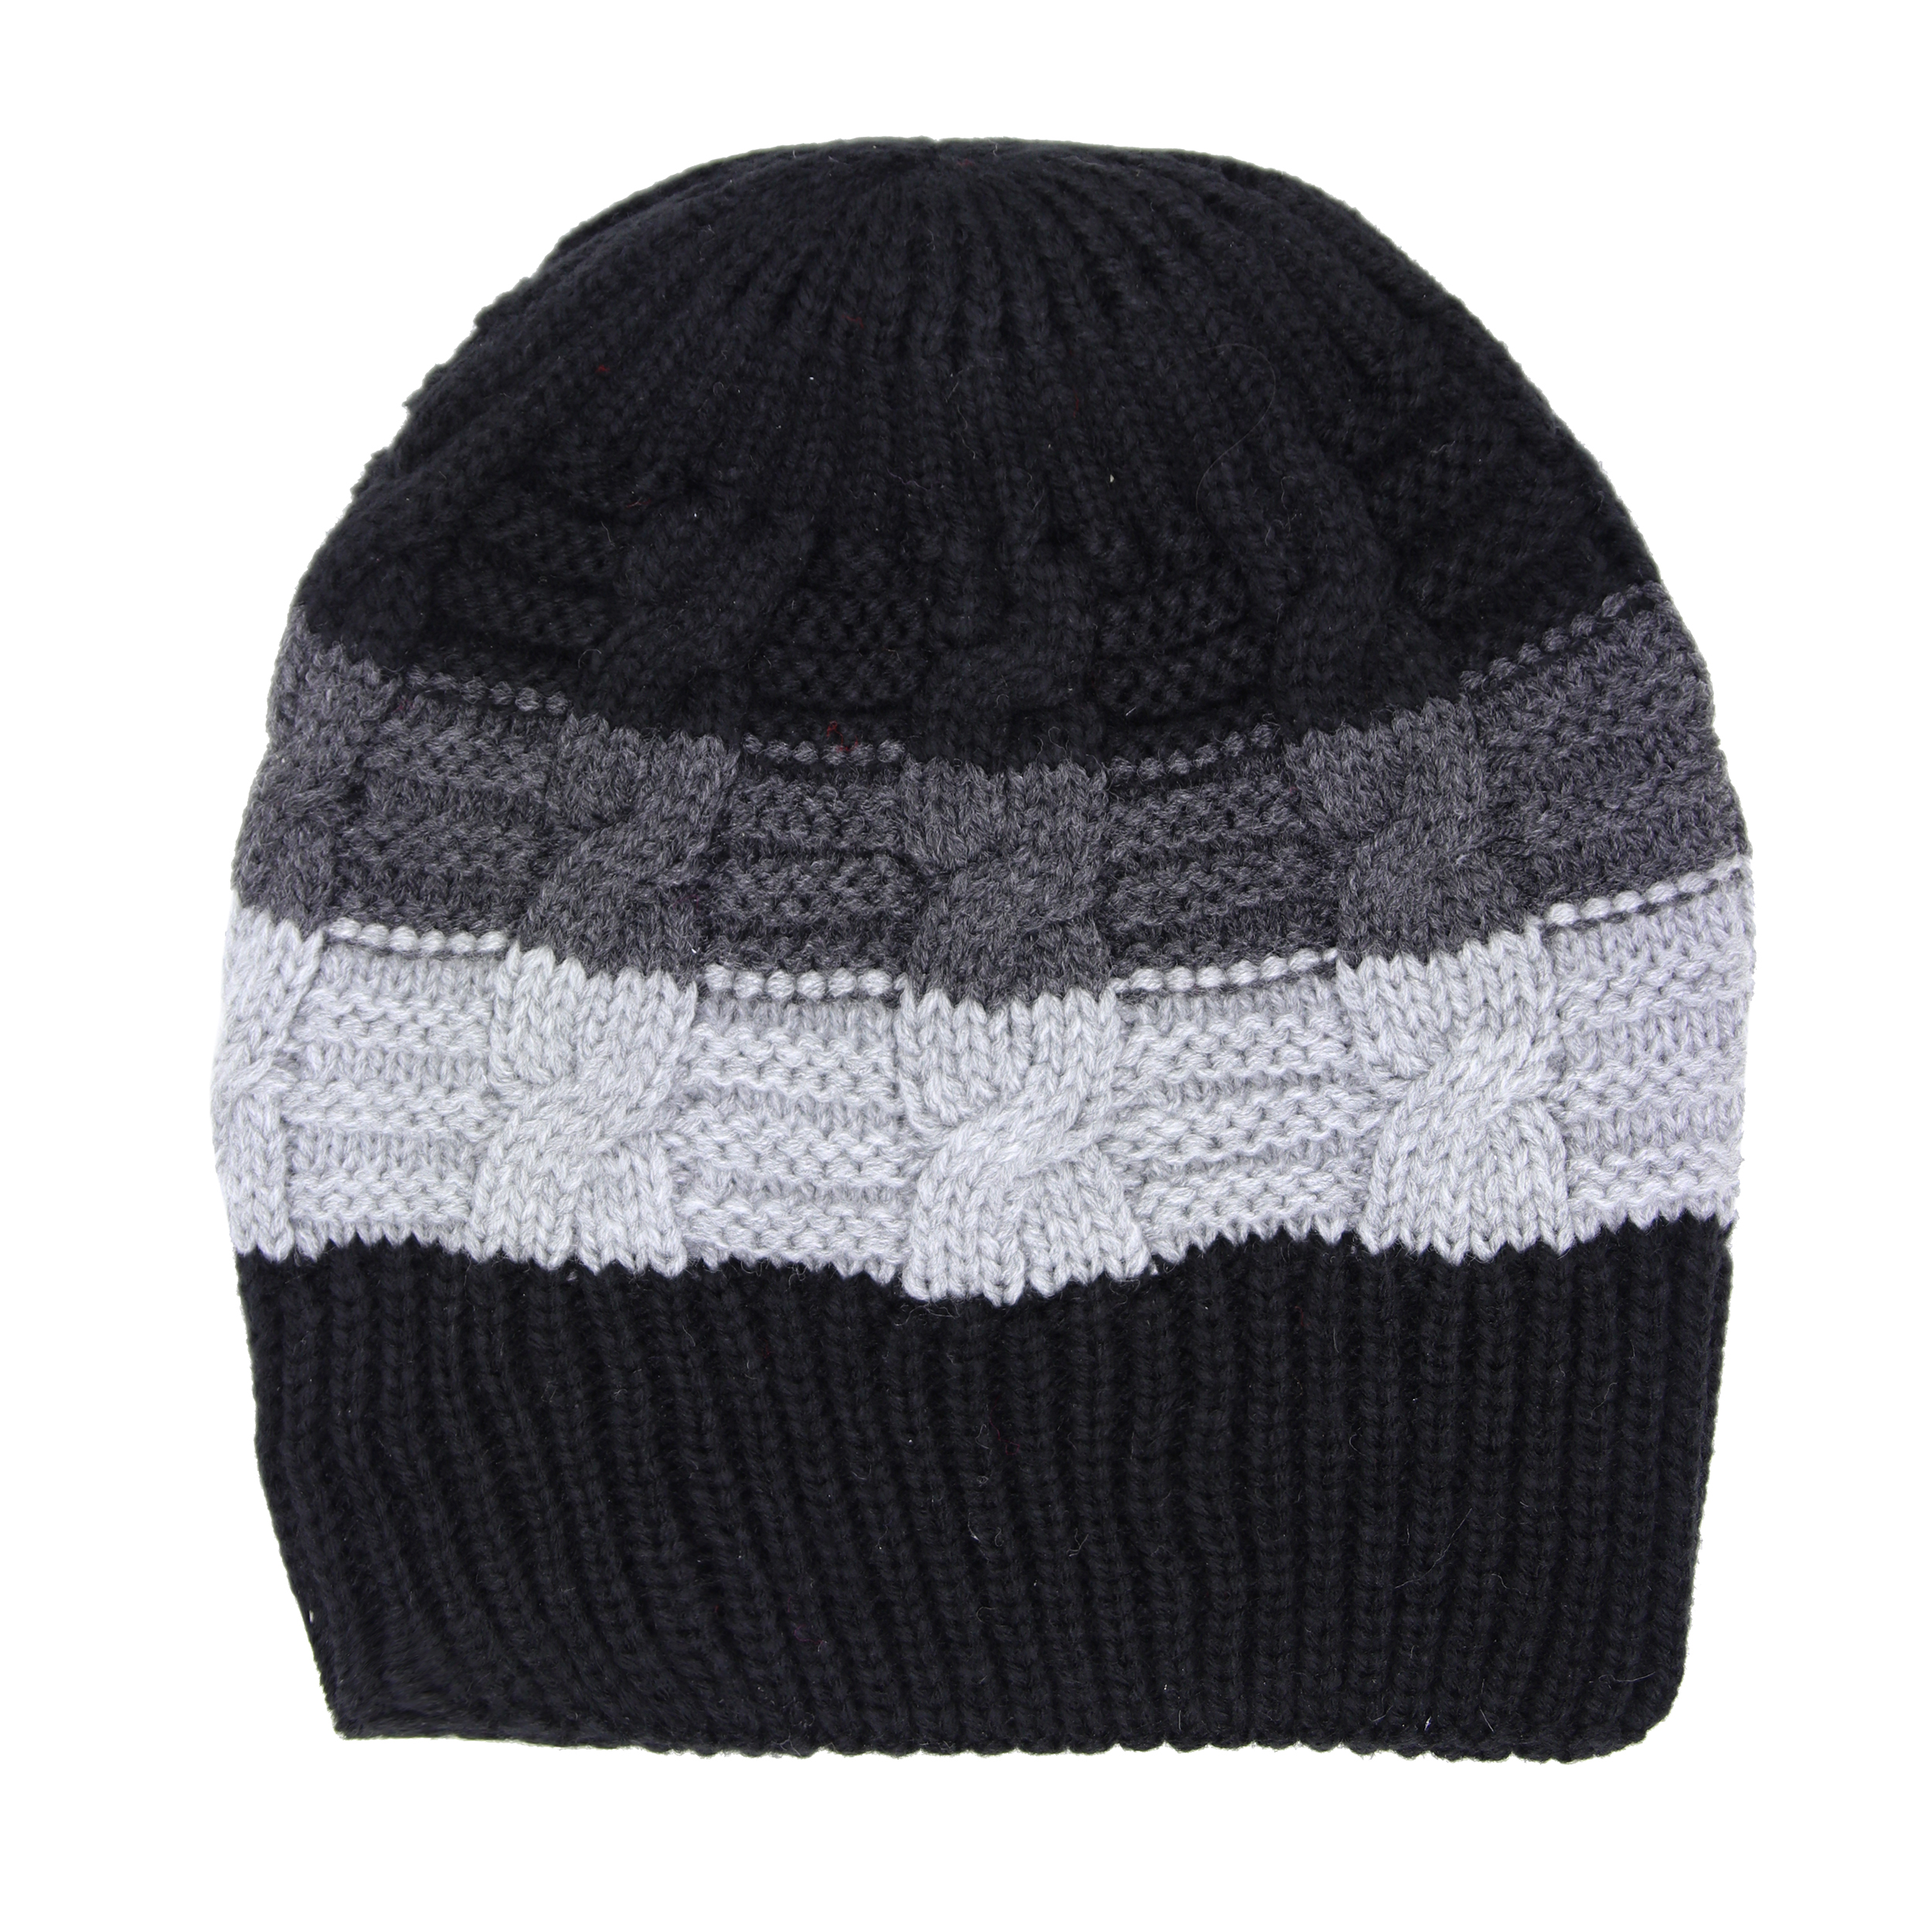 کلاه مردانه مدل M2040